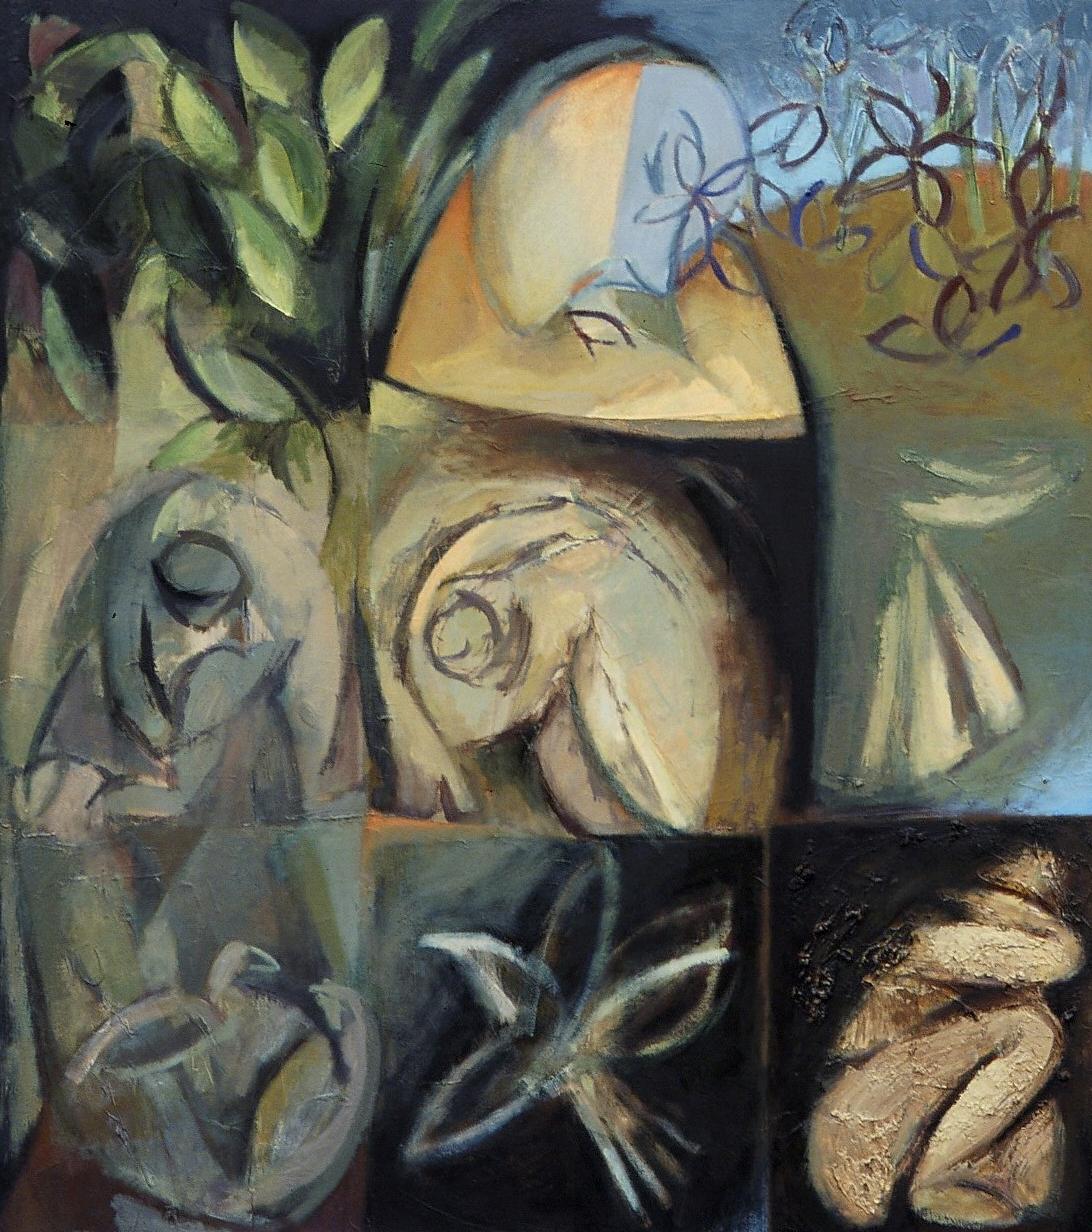 "Excavation , oil on canvas, 32"" x 28"", 2001"